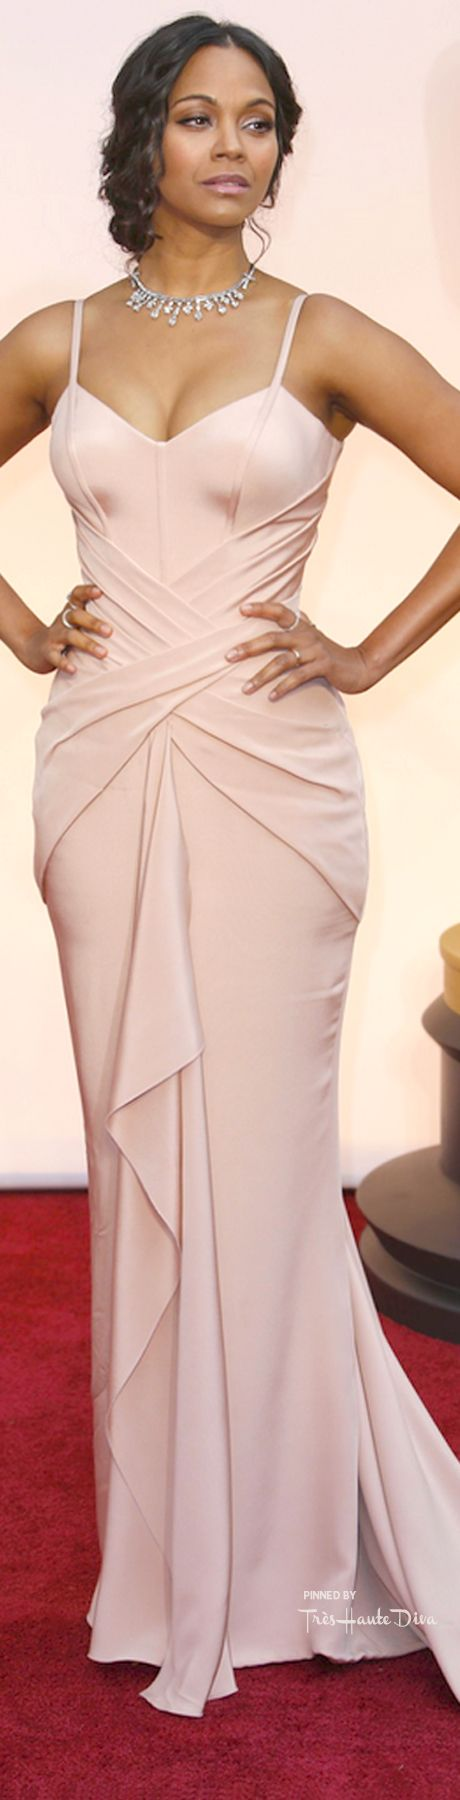 Oscars 2015 ♔ Zoe Saldana in an Atelier Versace gown | THE GOWN ...